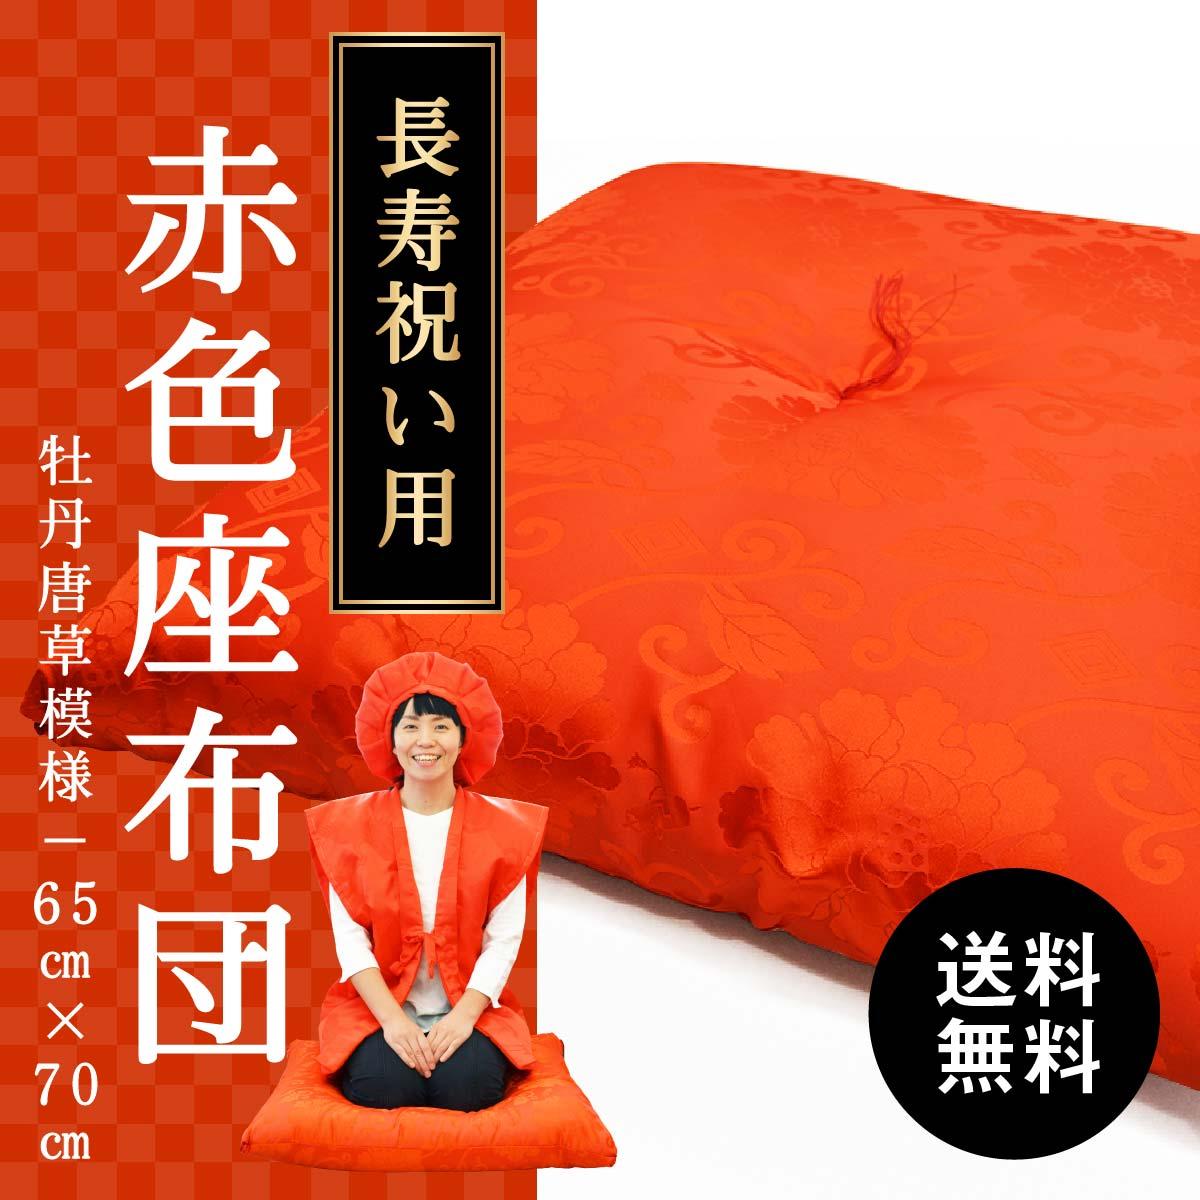 還暦のお祝い用[座布団]牡丹唐草模様65cm×70cm(綿量1.6kg)|赤色